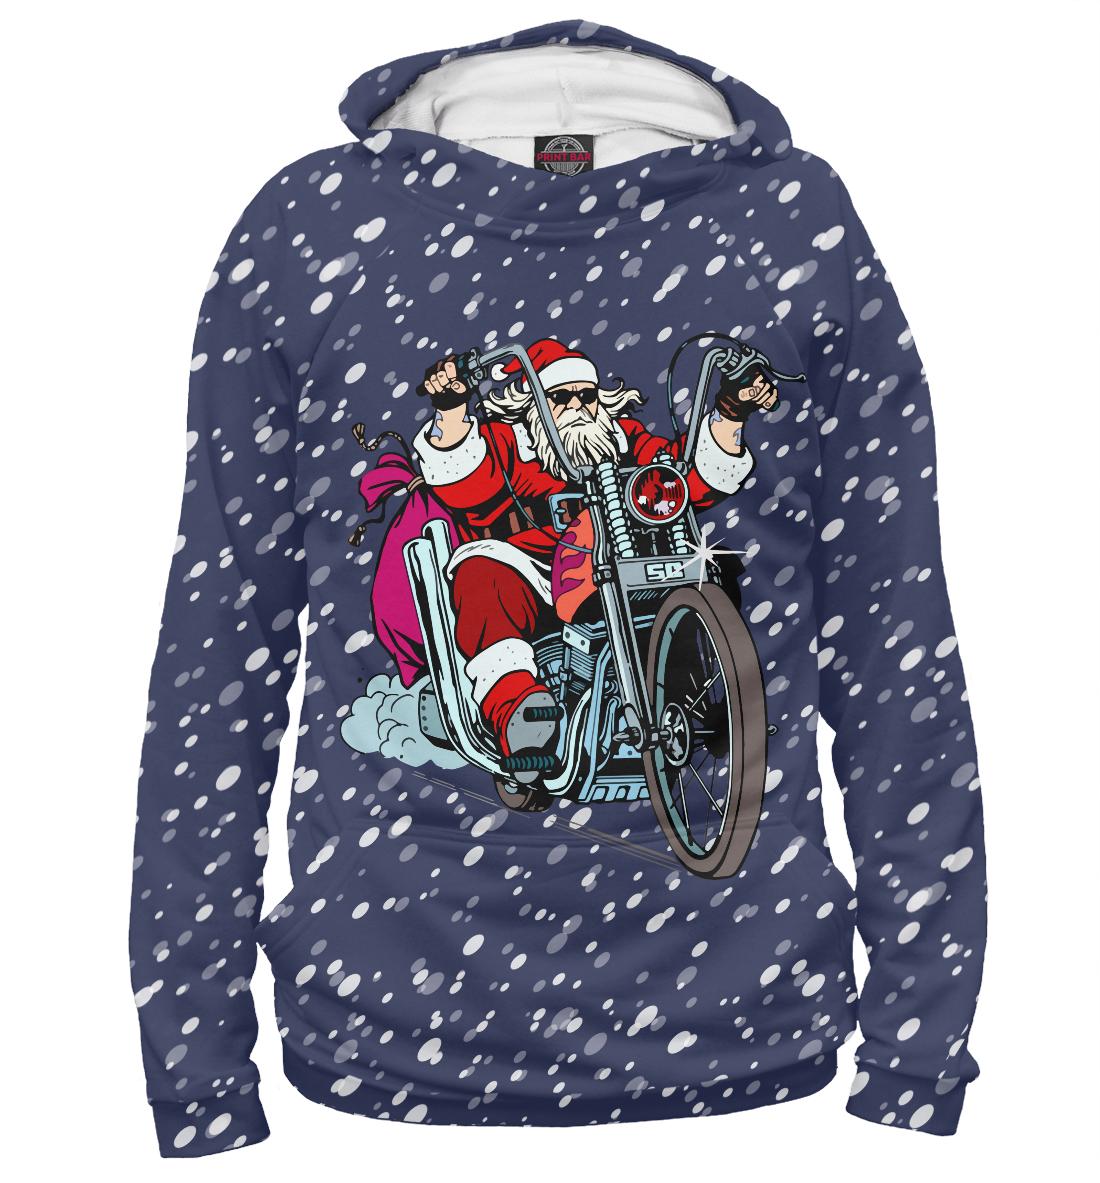 Купить Санта Клаус байкер, Printbar, Худи, NOV-248863-hud-1